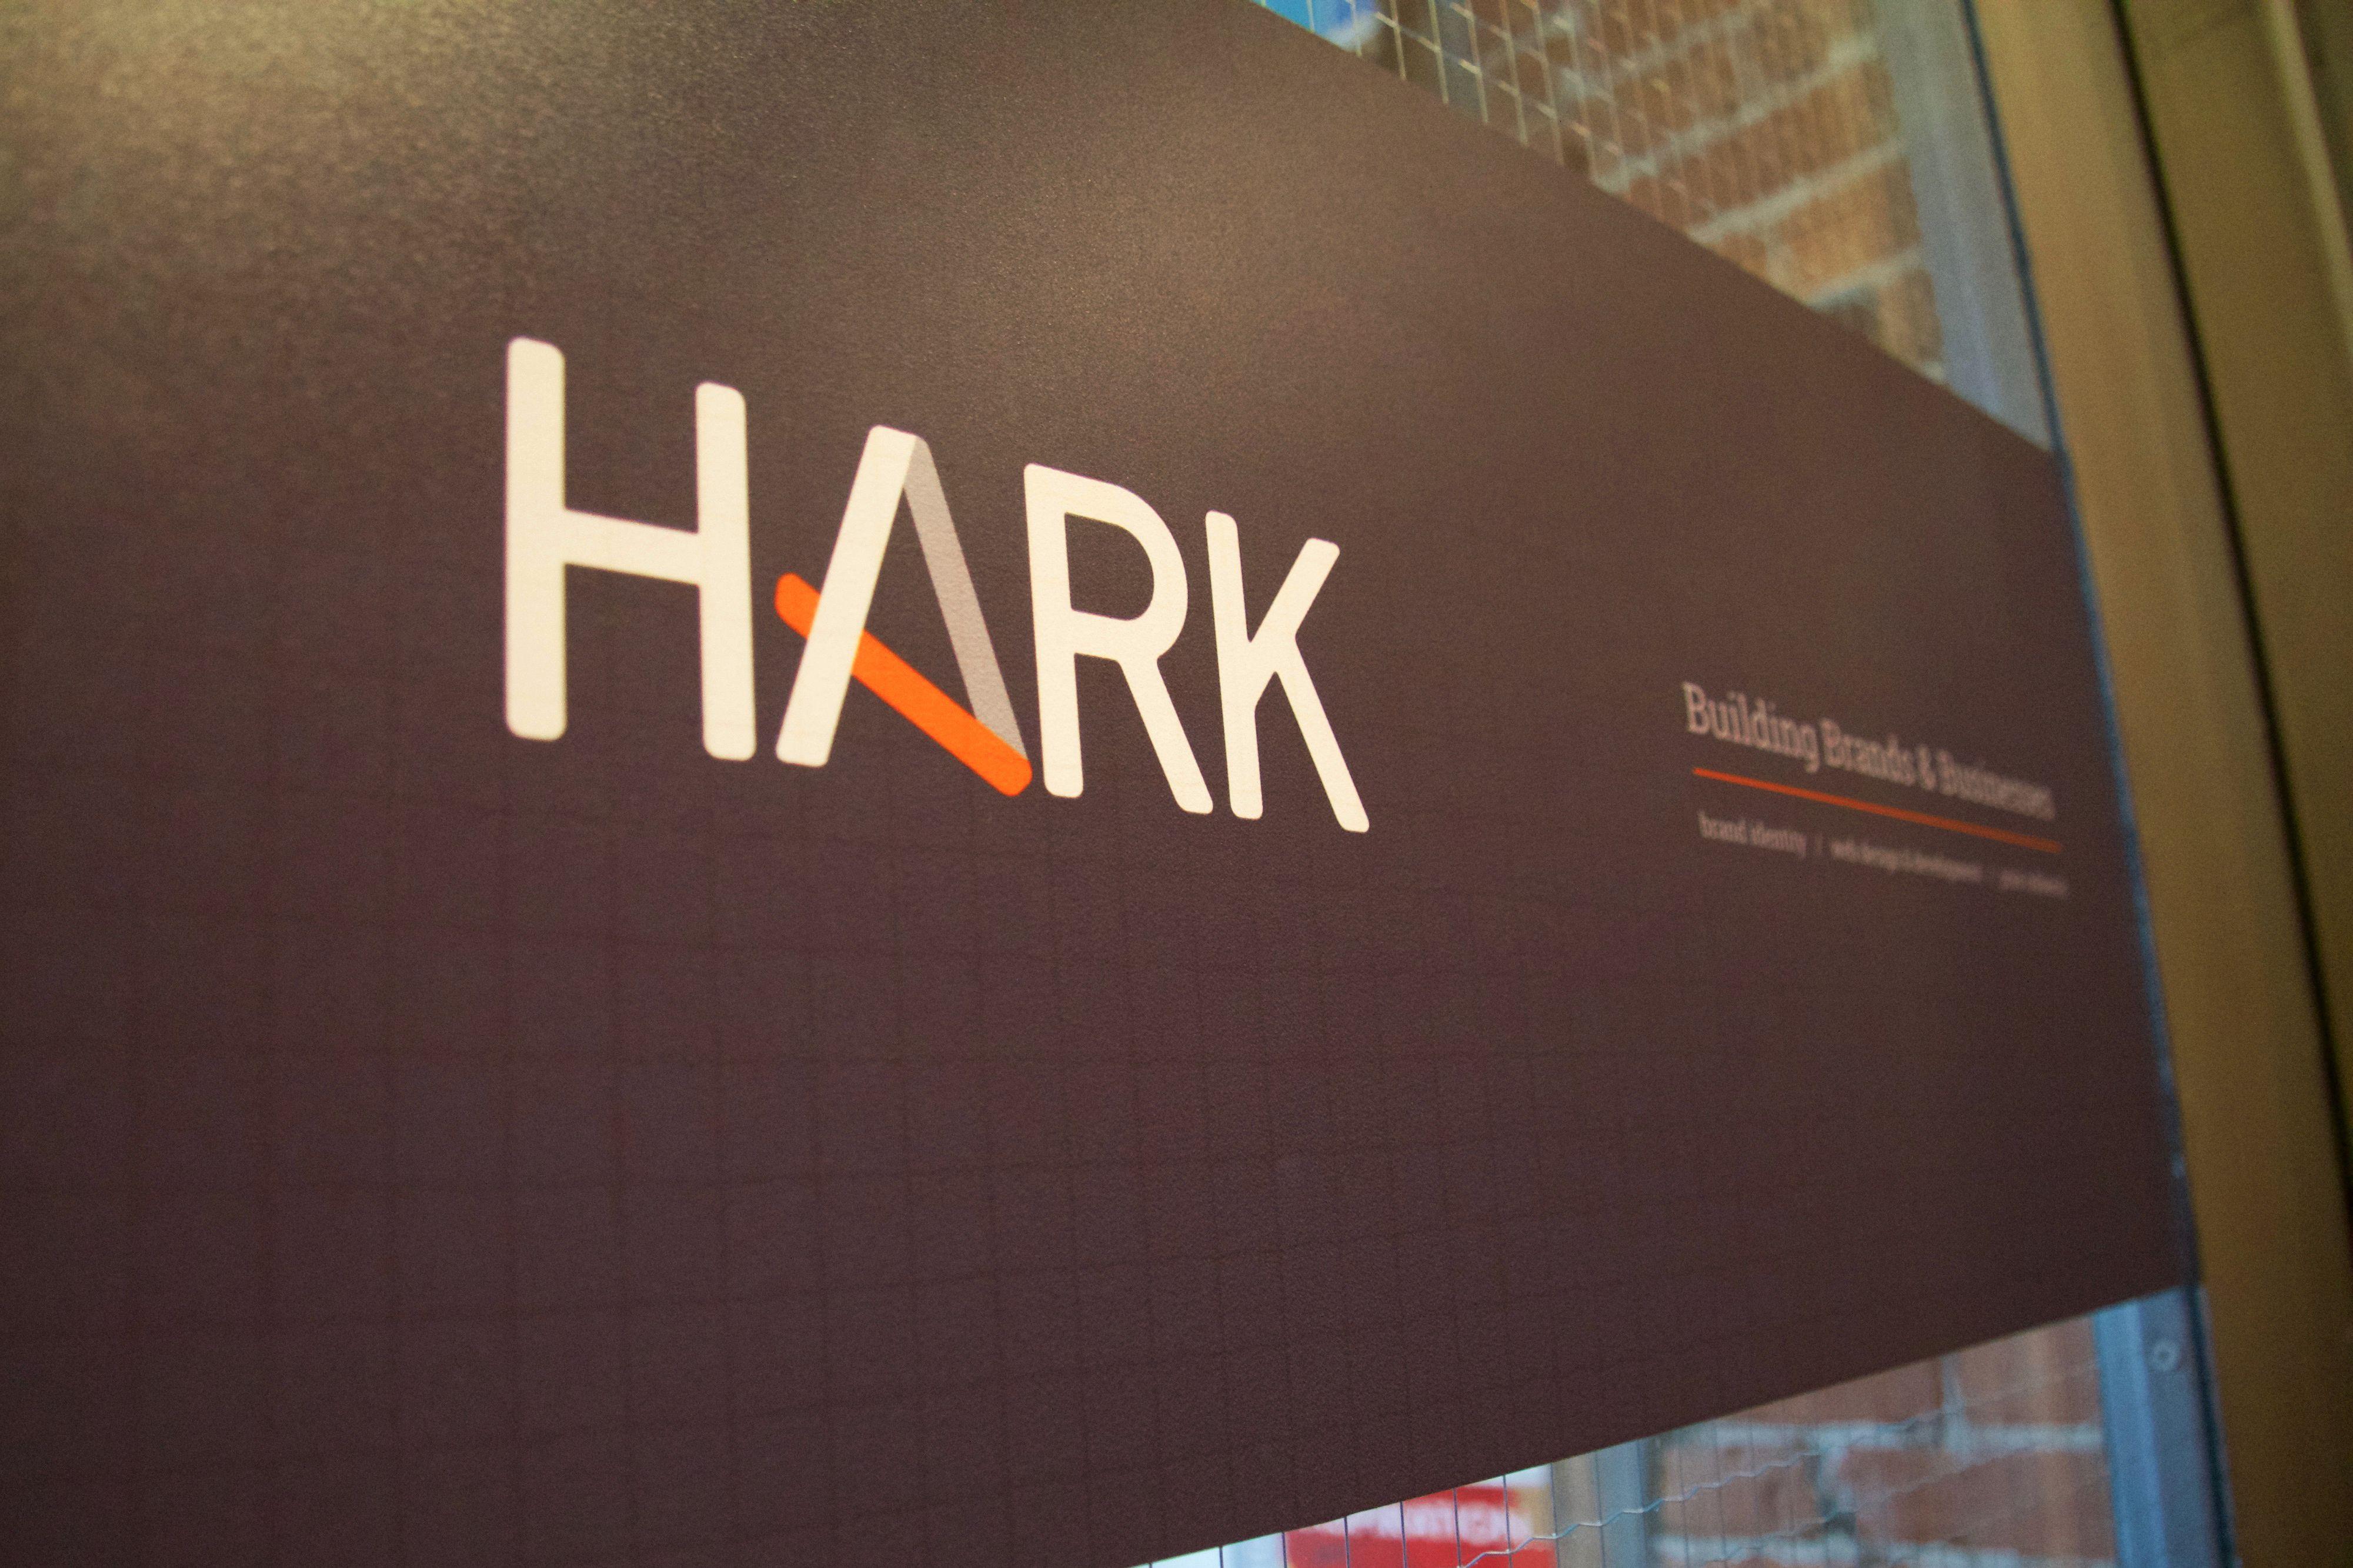 Pin By Hark On Hark Burlington Vt Office Web Design Digital Marketing Website Design